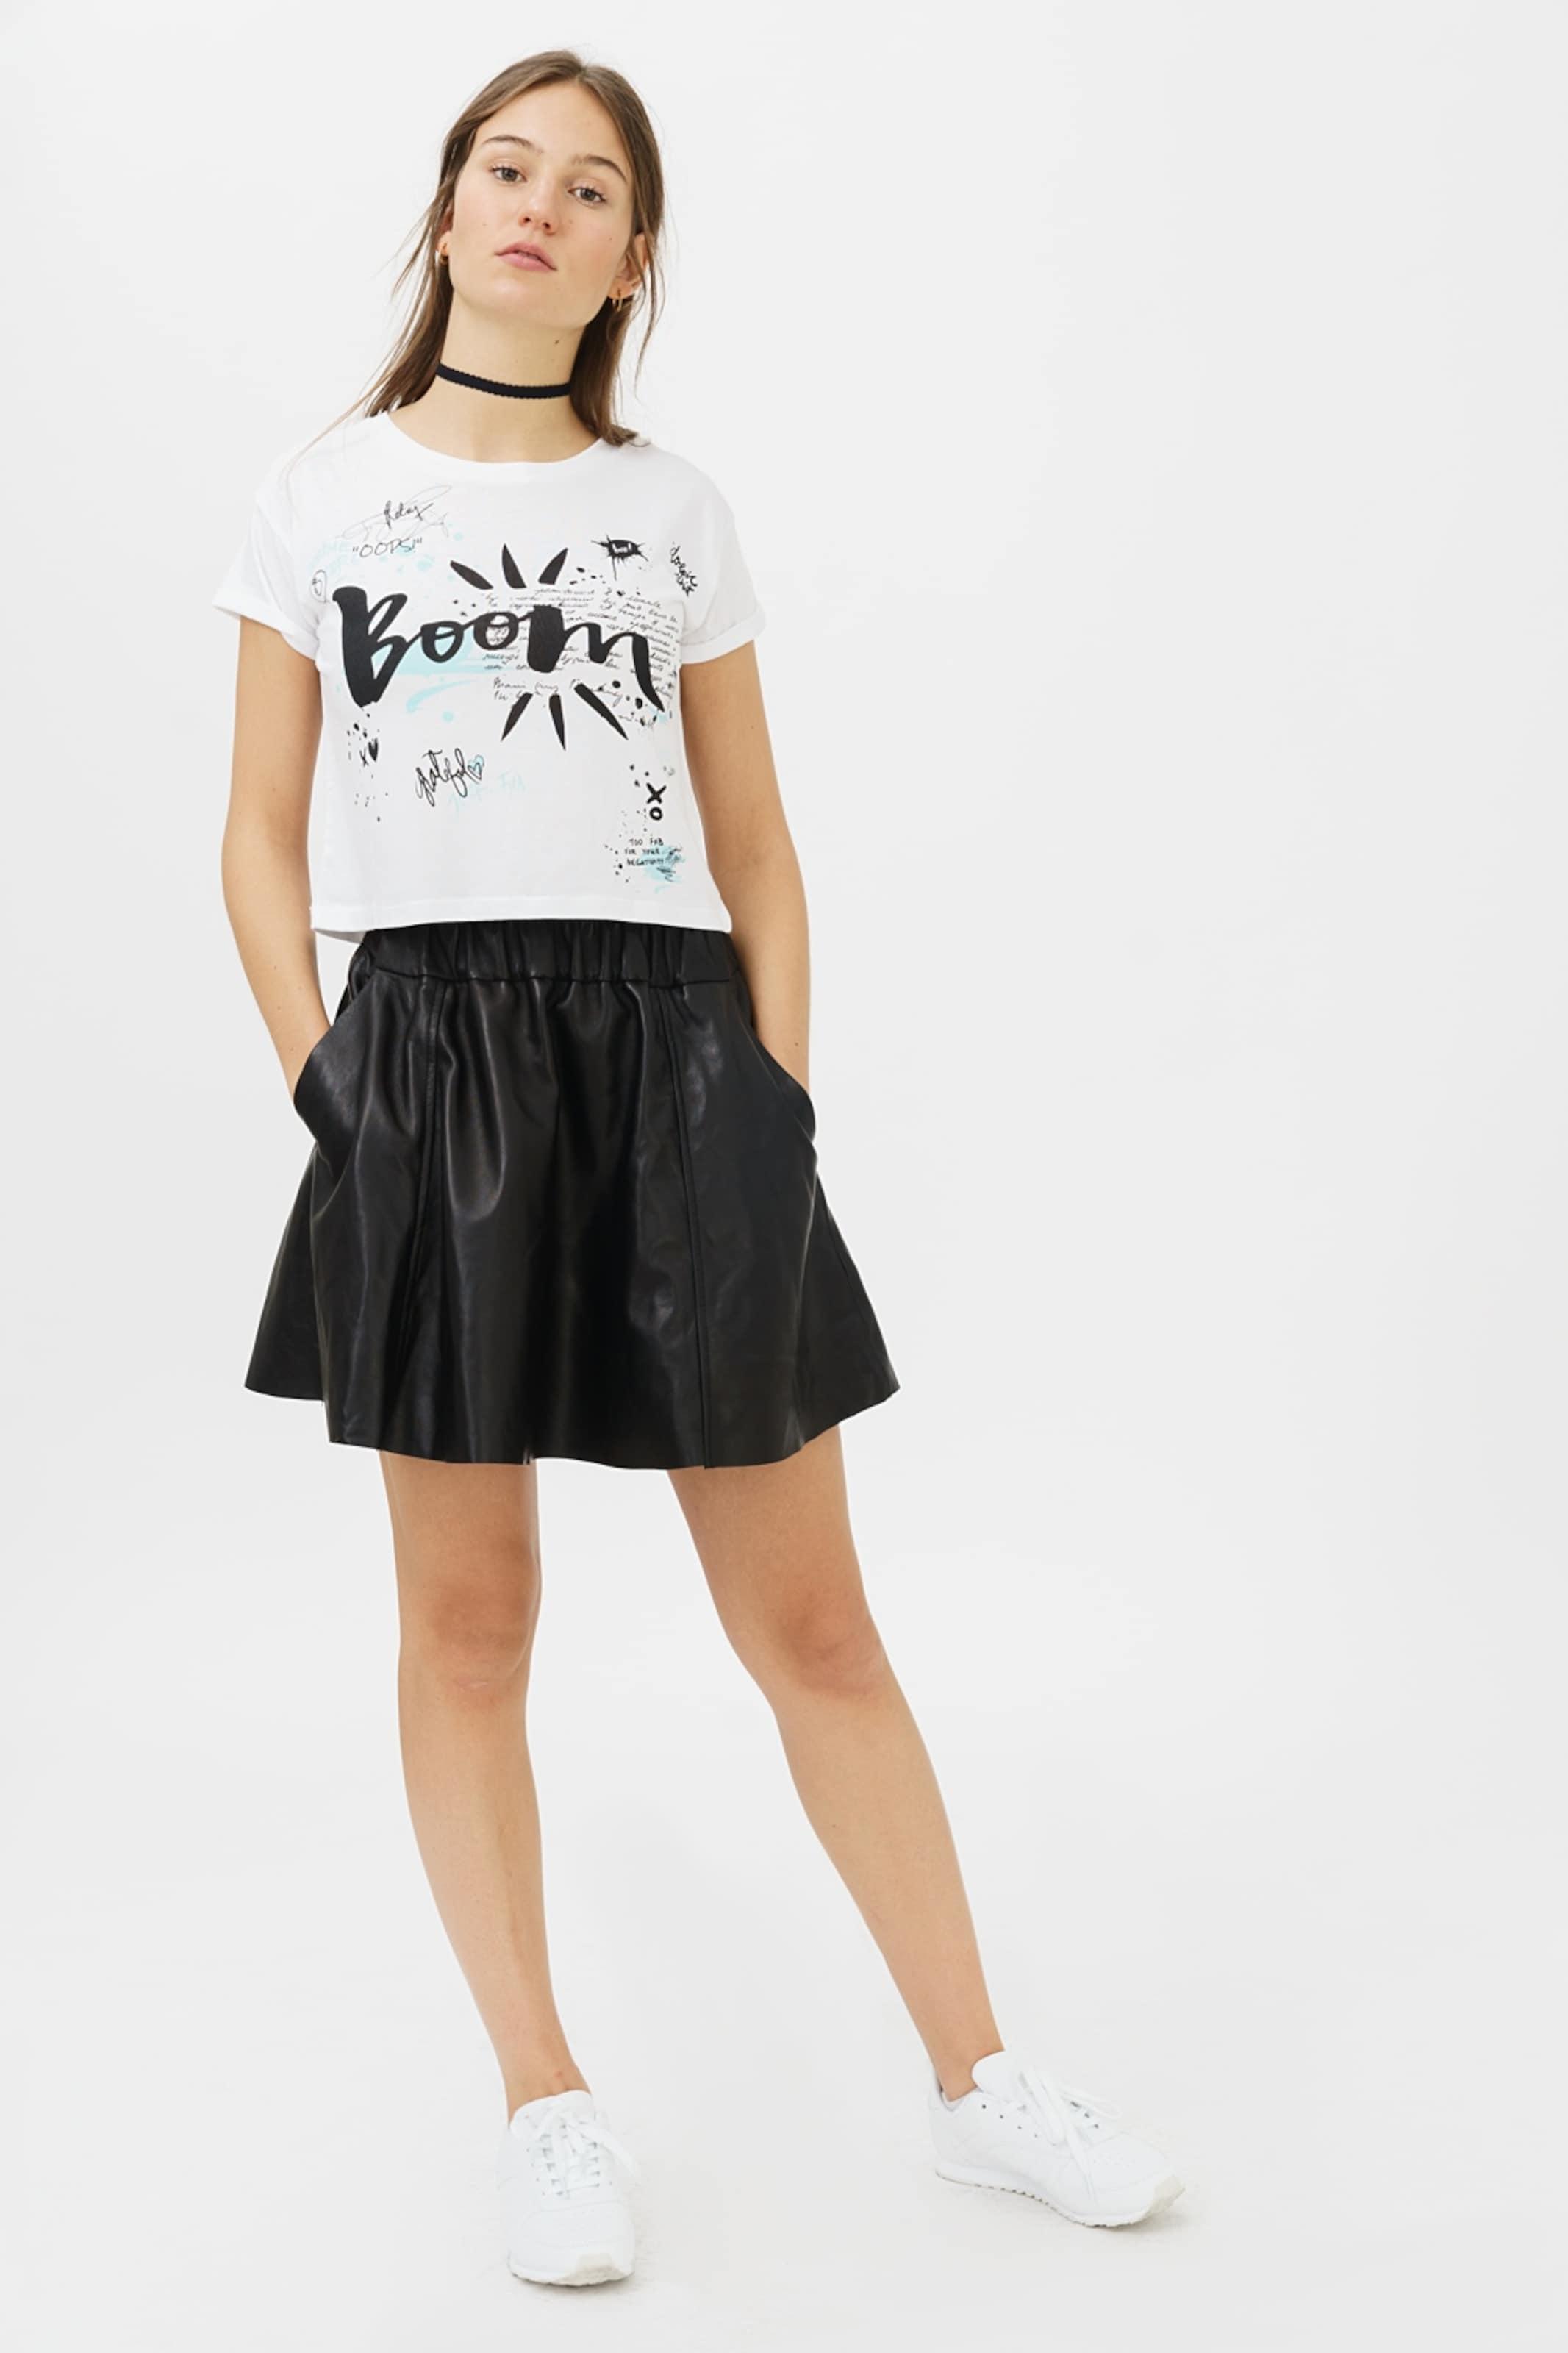 Trueprodigy Trueprodigy shirt In T T shirt In Weiß c5ALq4R3j